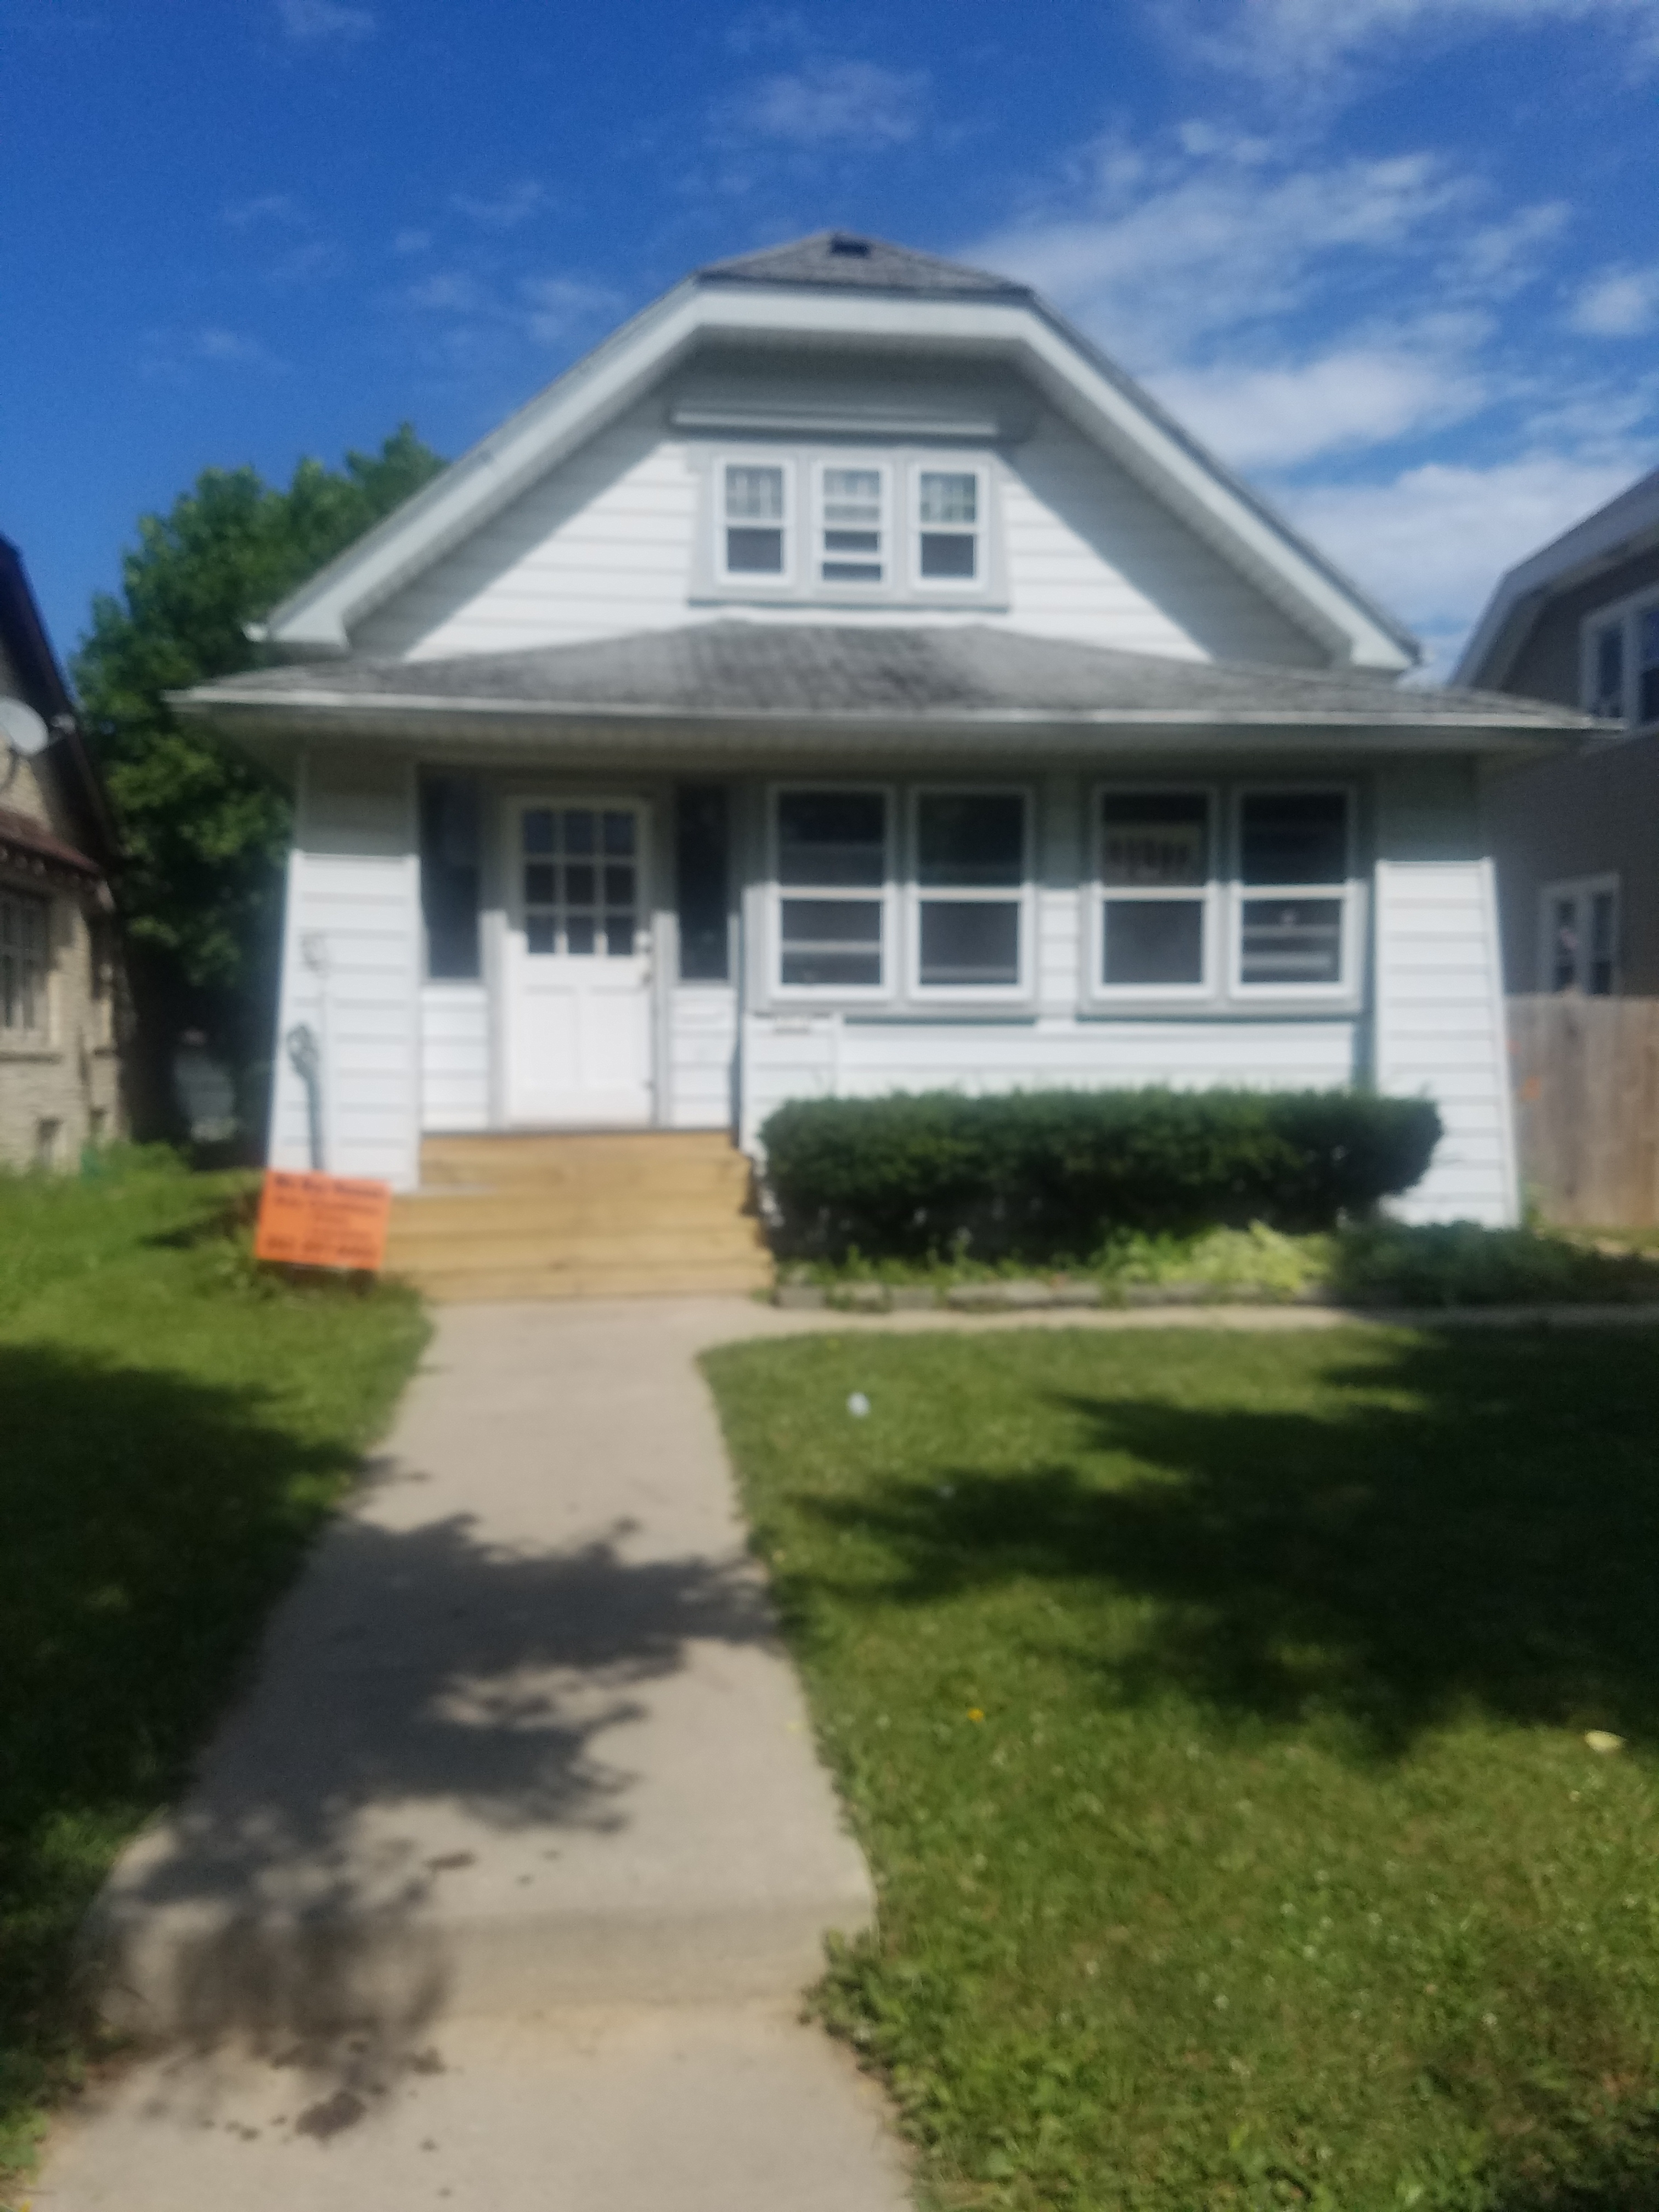 2836 N 39th St, Milwaukee, WI